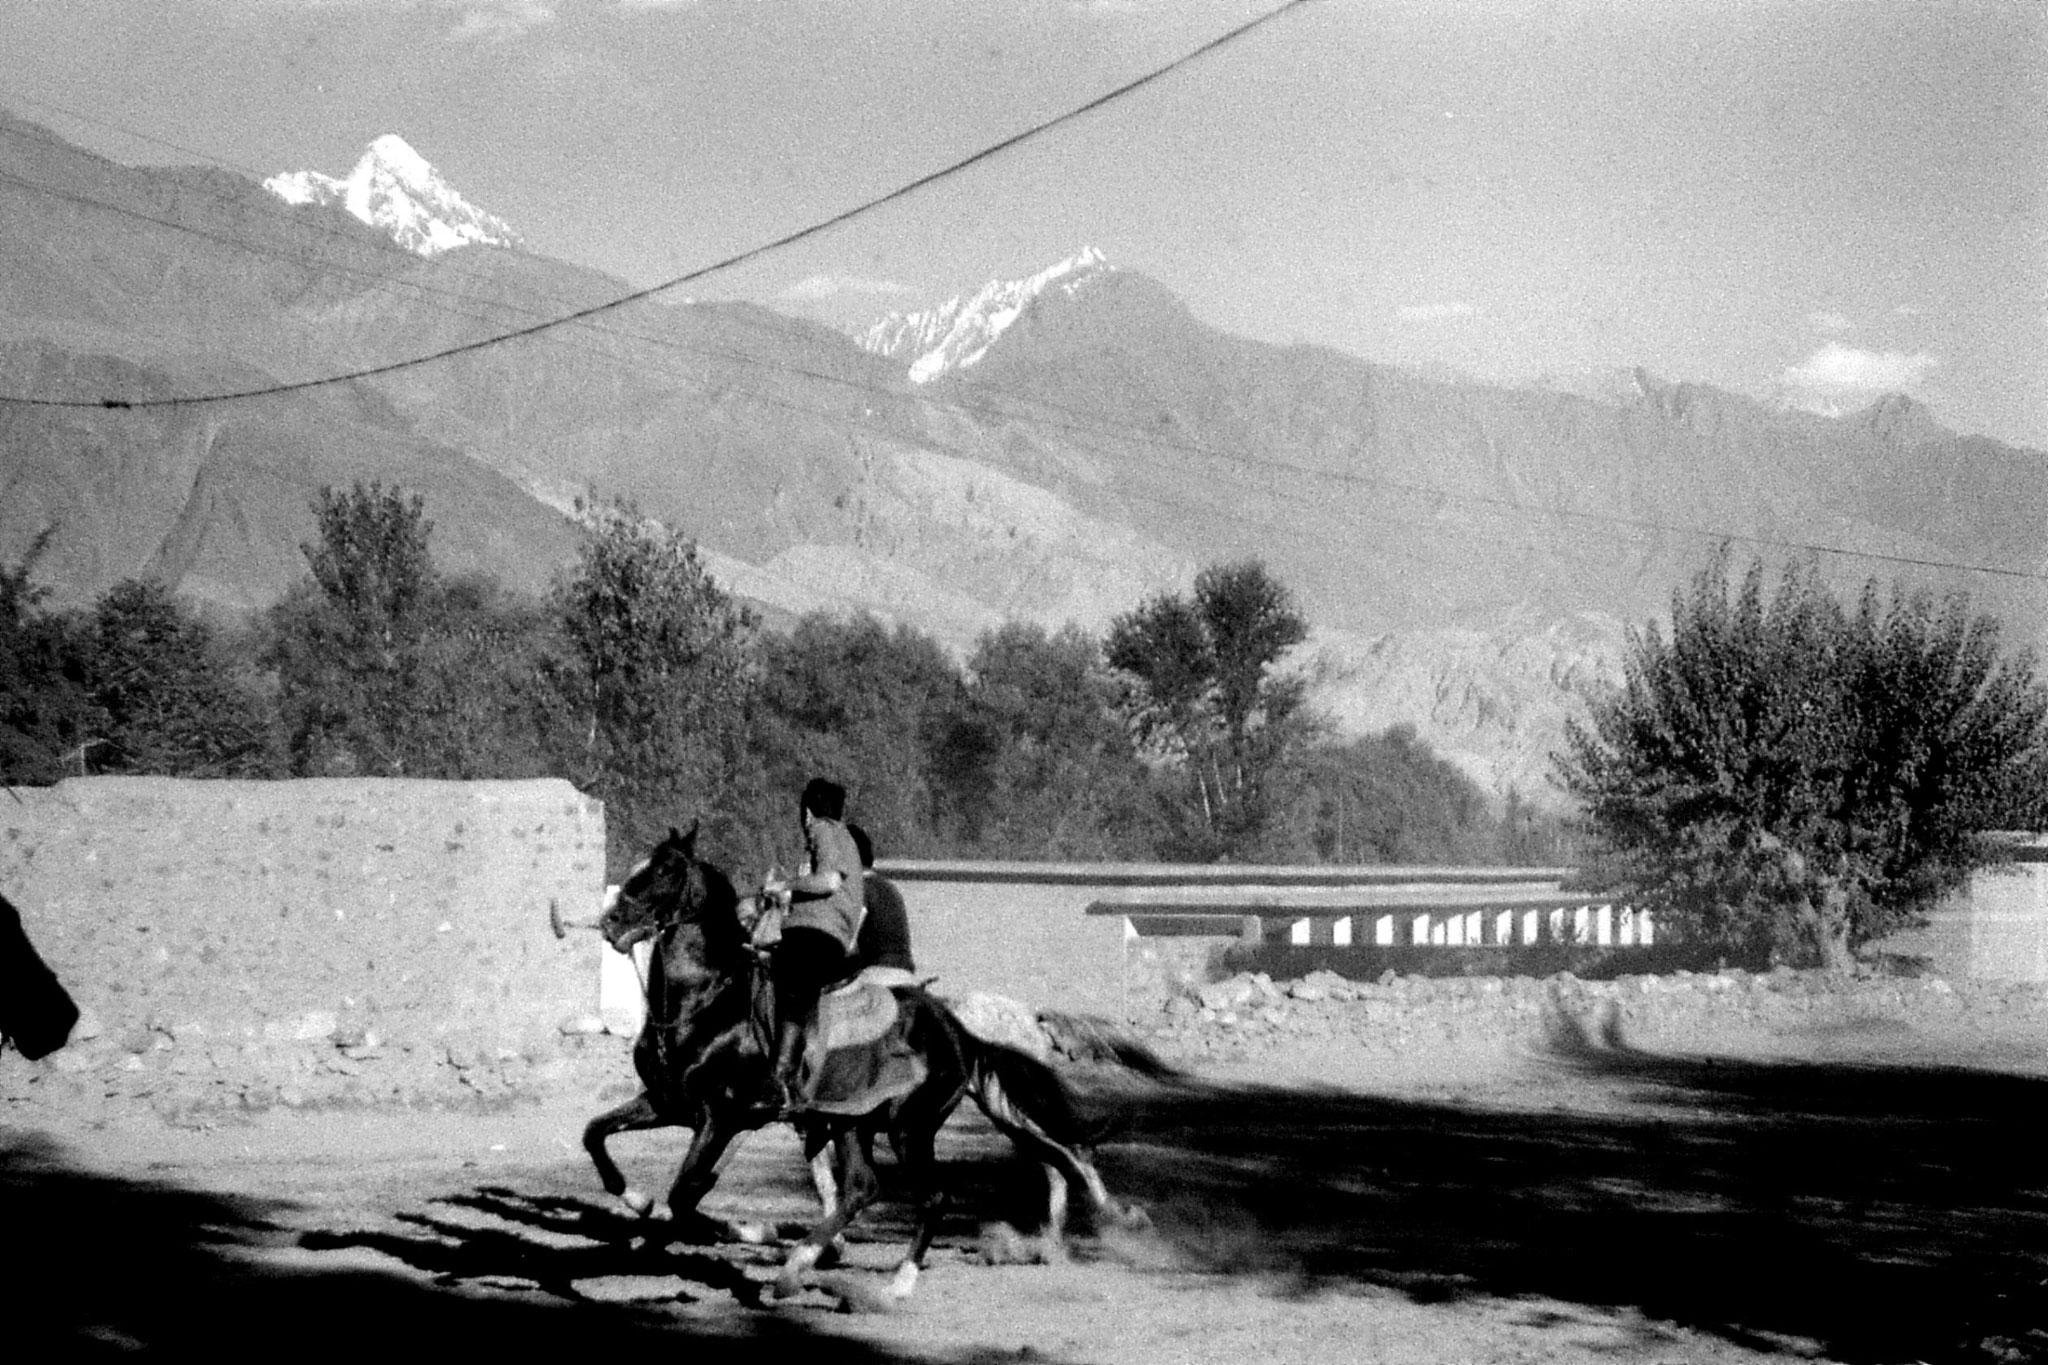 9/10/1989: 7: Gilgit polo match